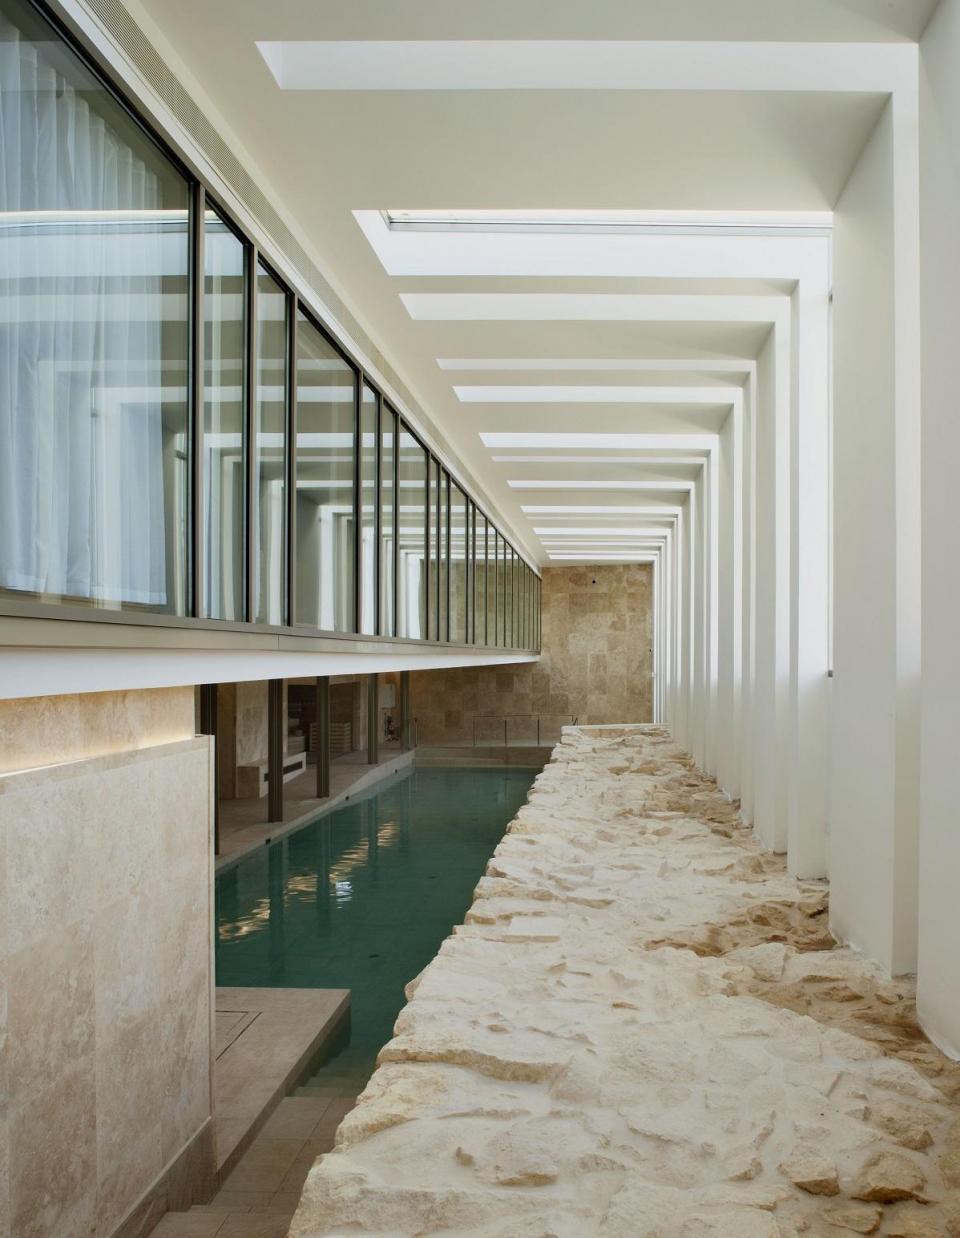 AP Valletta won an award last year for their work at the Phoenicia Hotel spa. Photo: AP